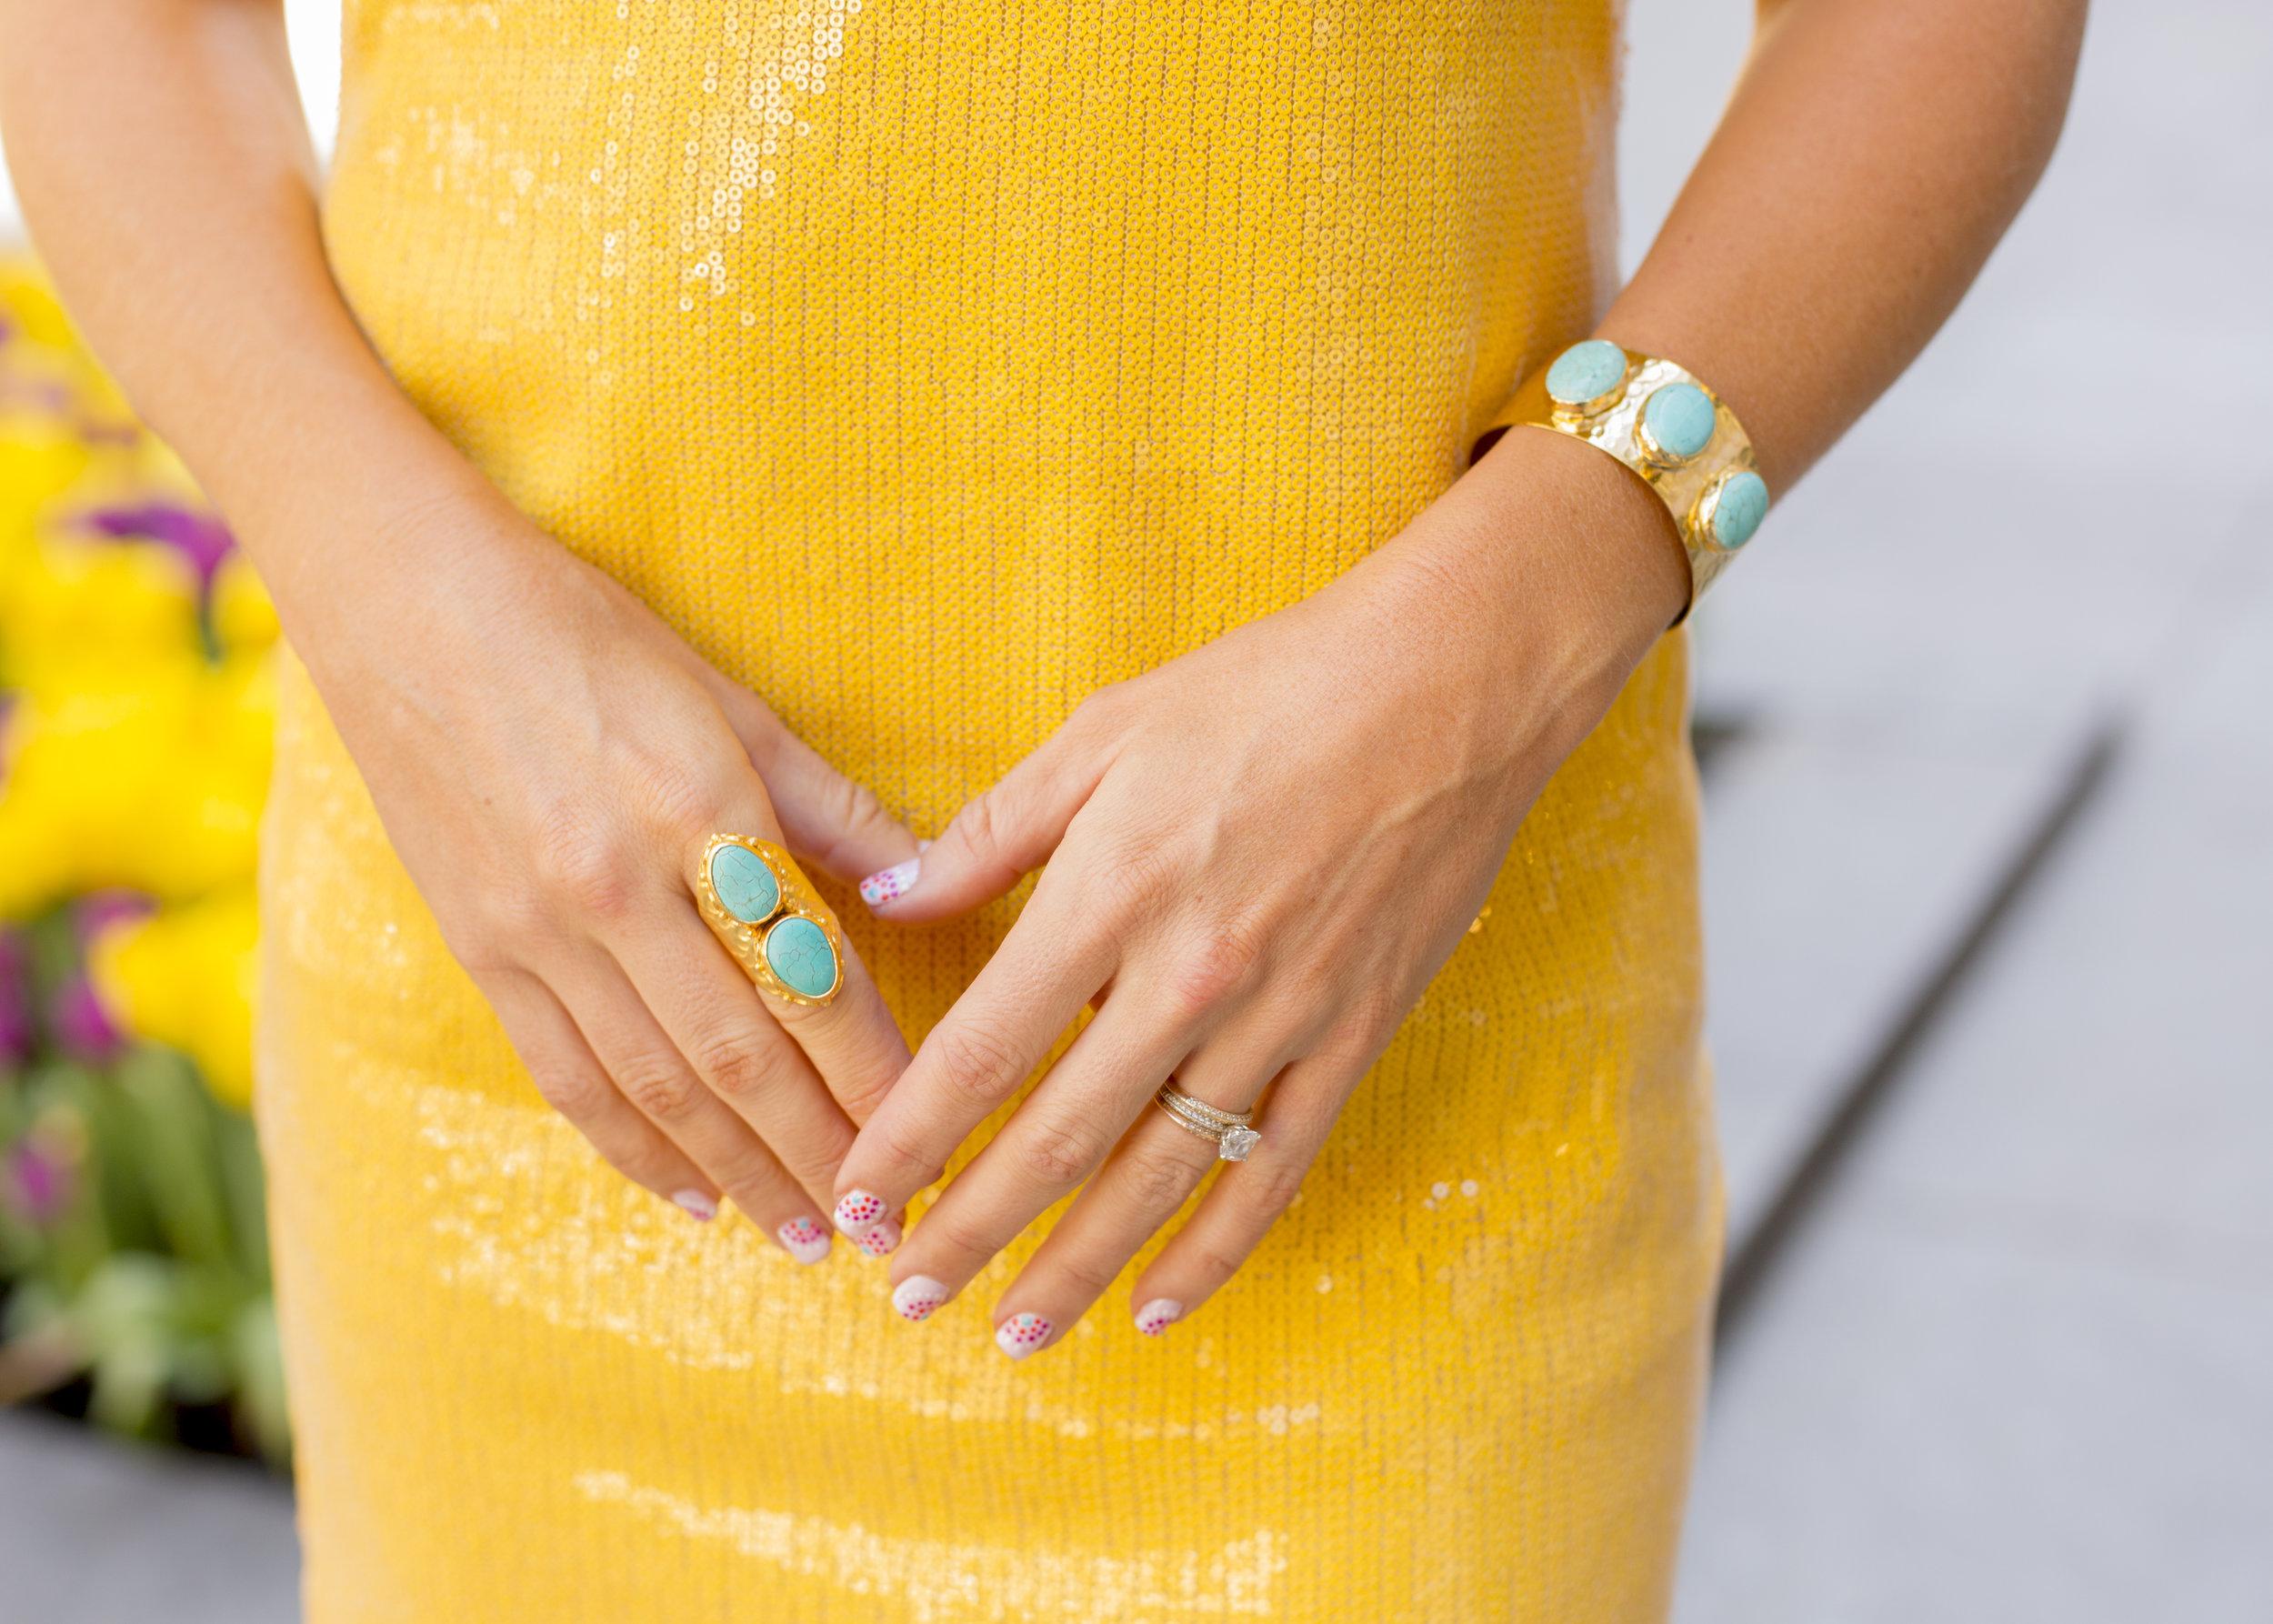 Anna Kooiman New York City Yellow Sequin Dress Fashion April 2018